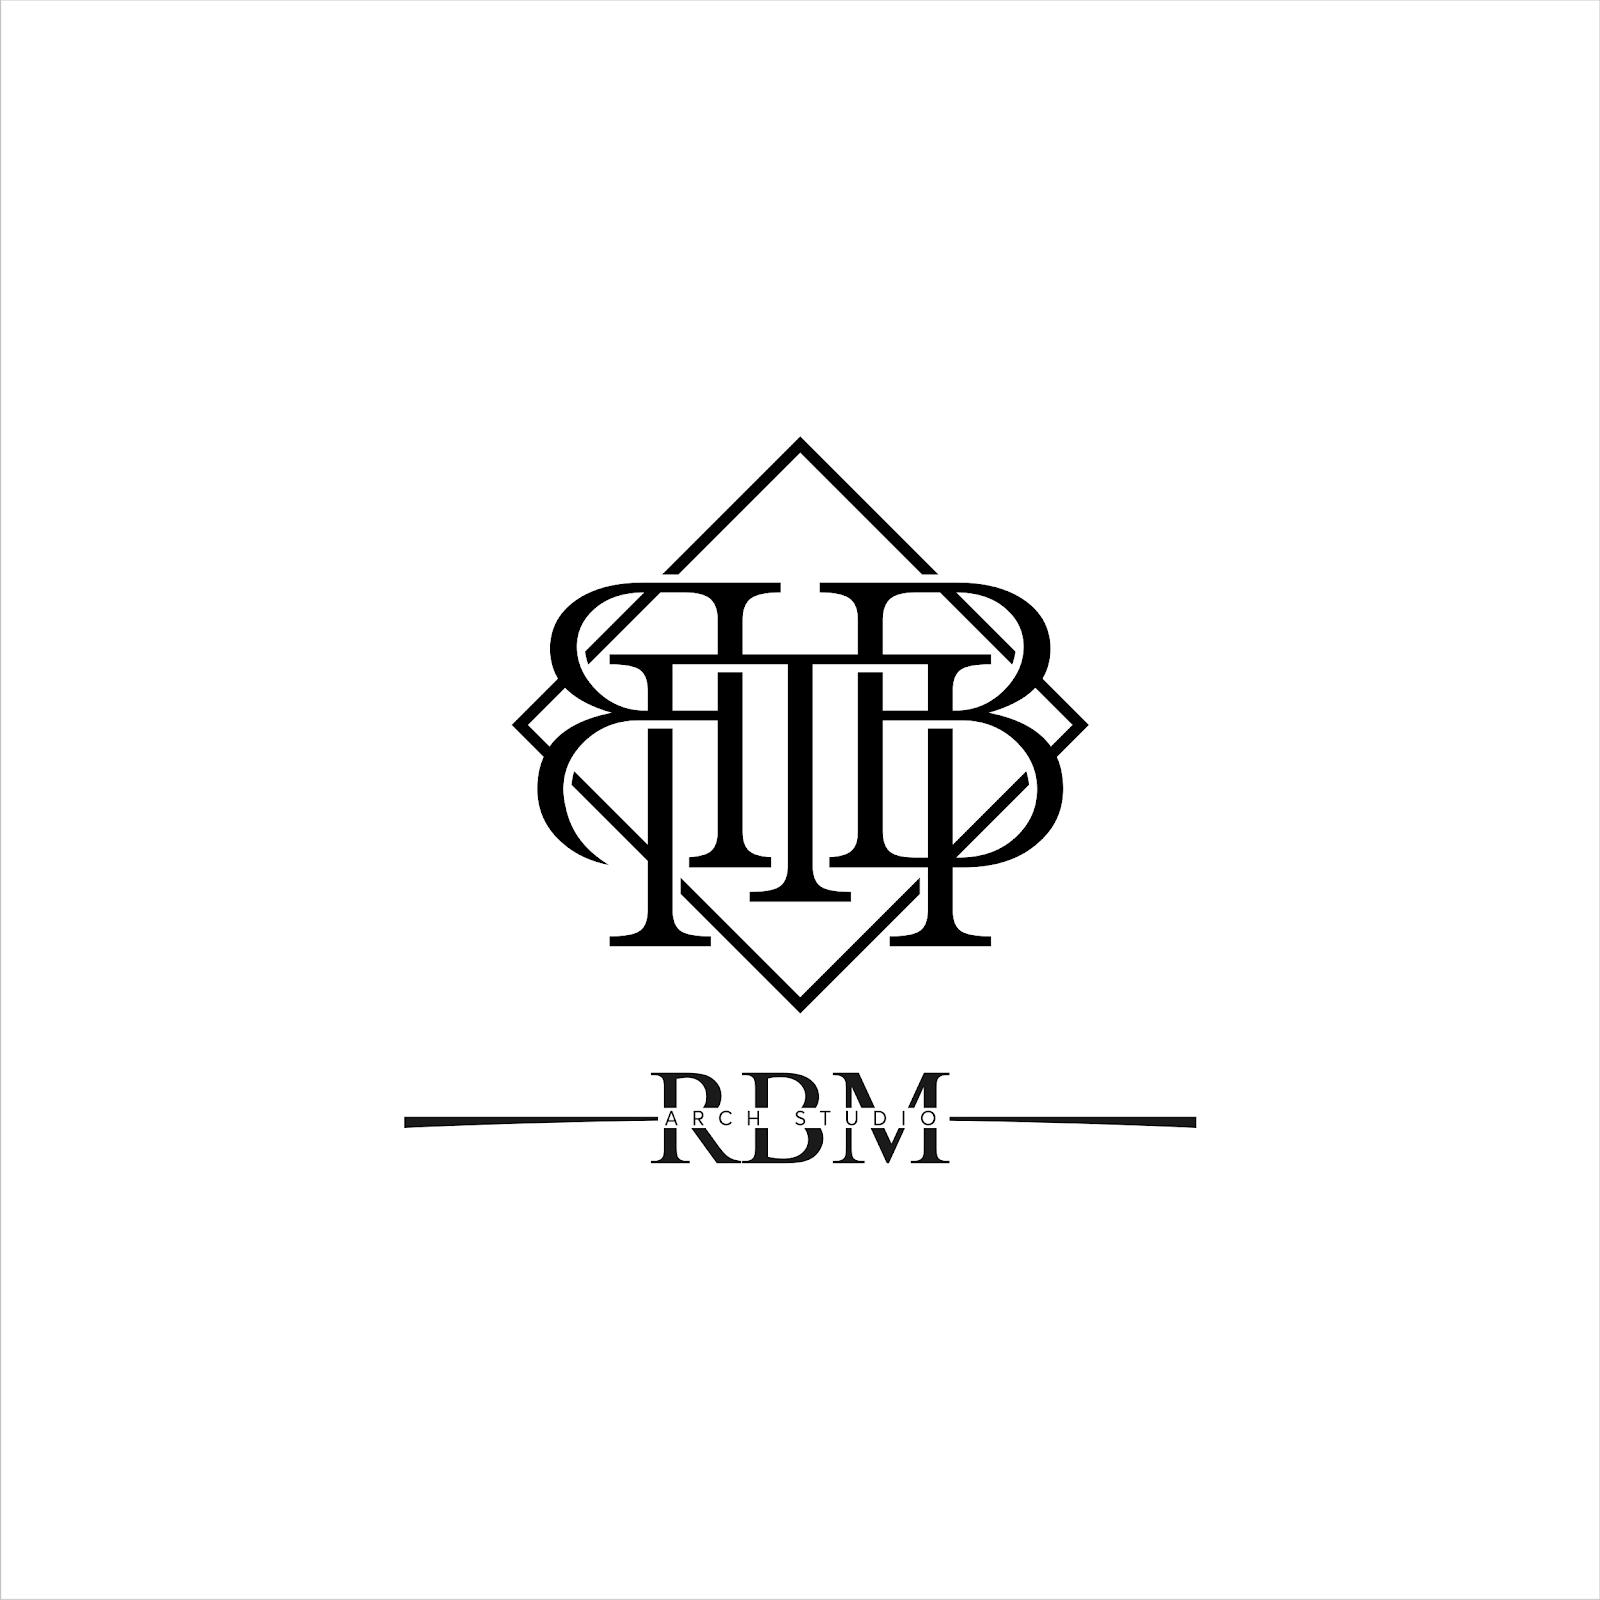 RBM Arch Studio